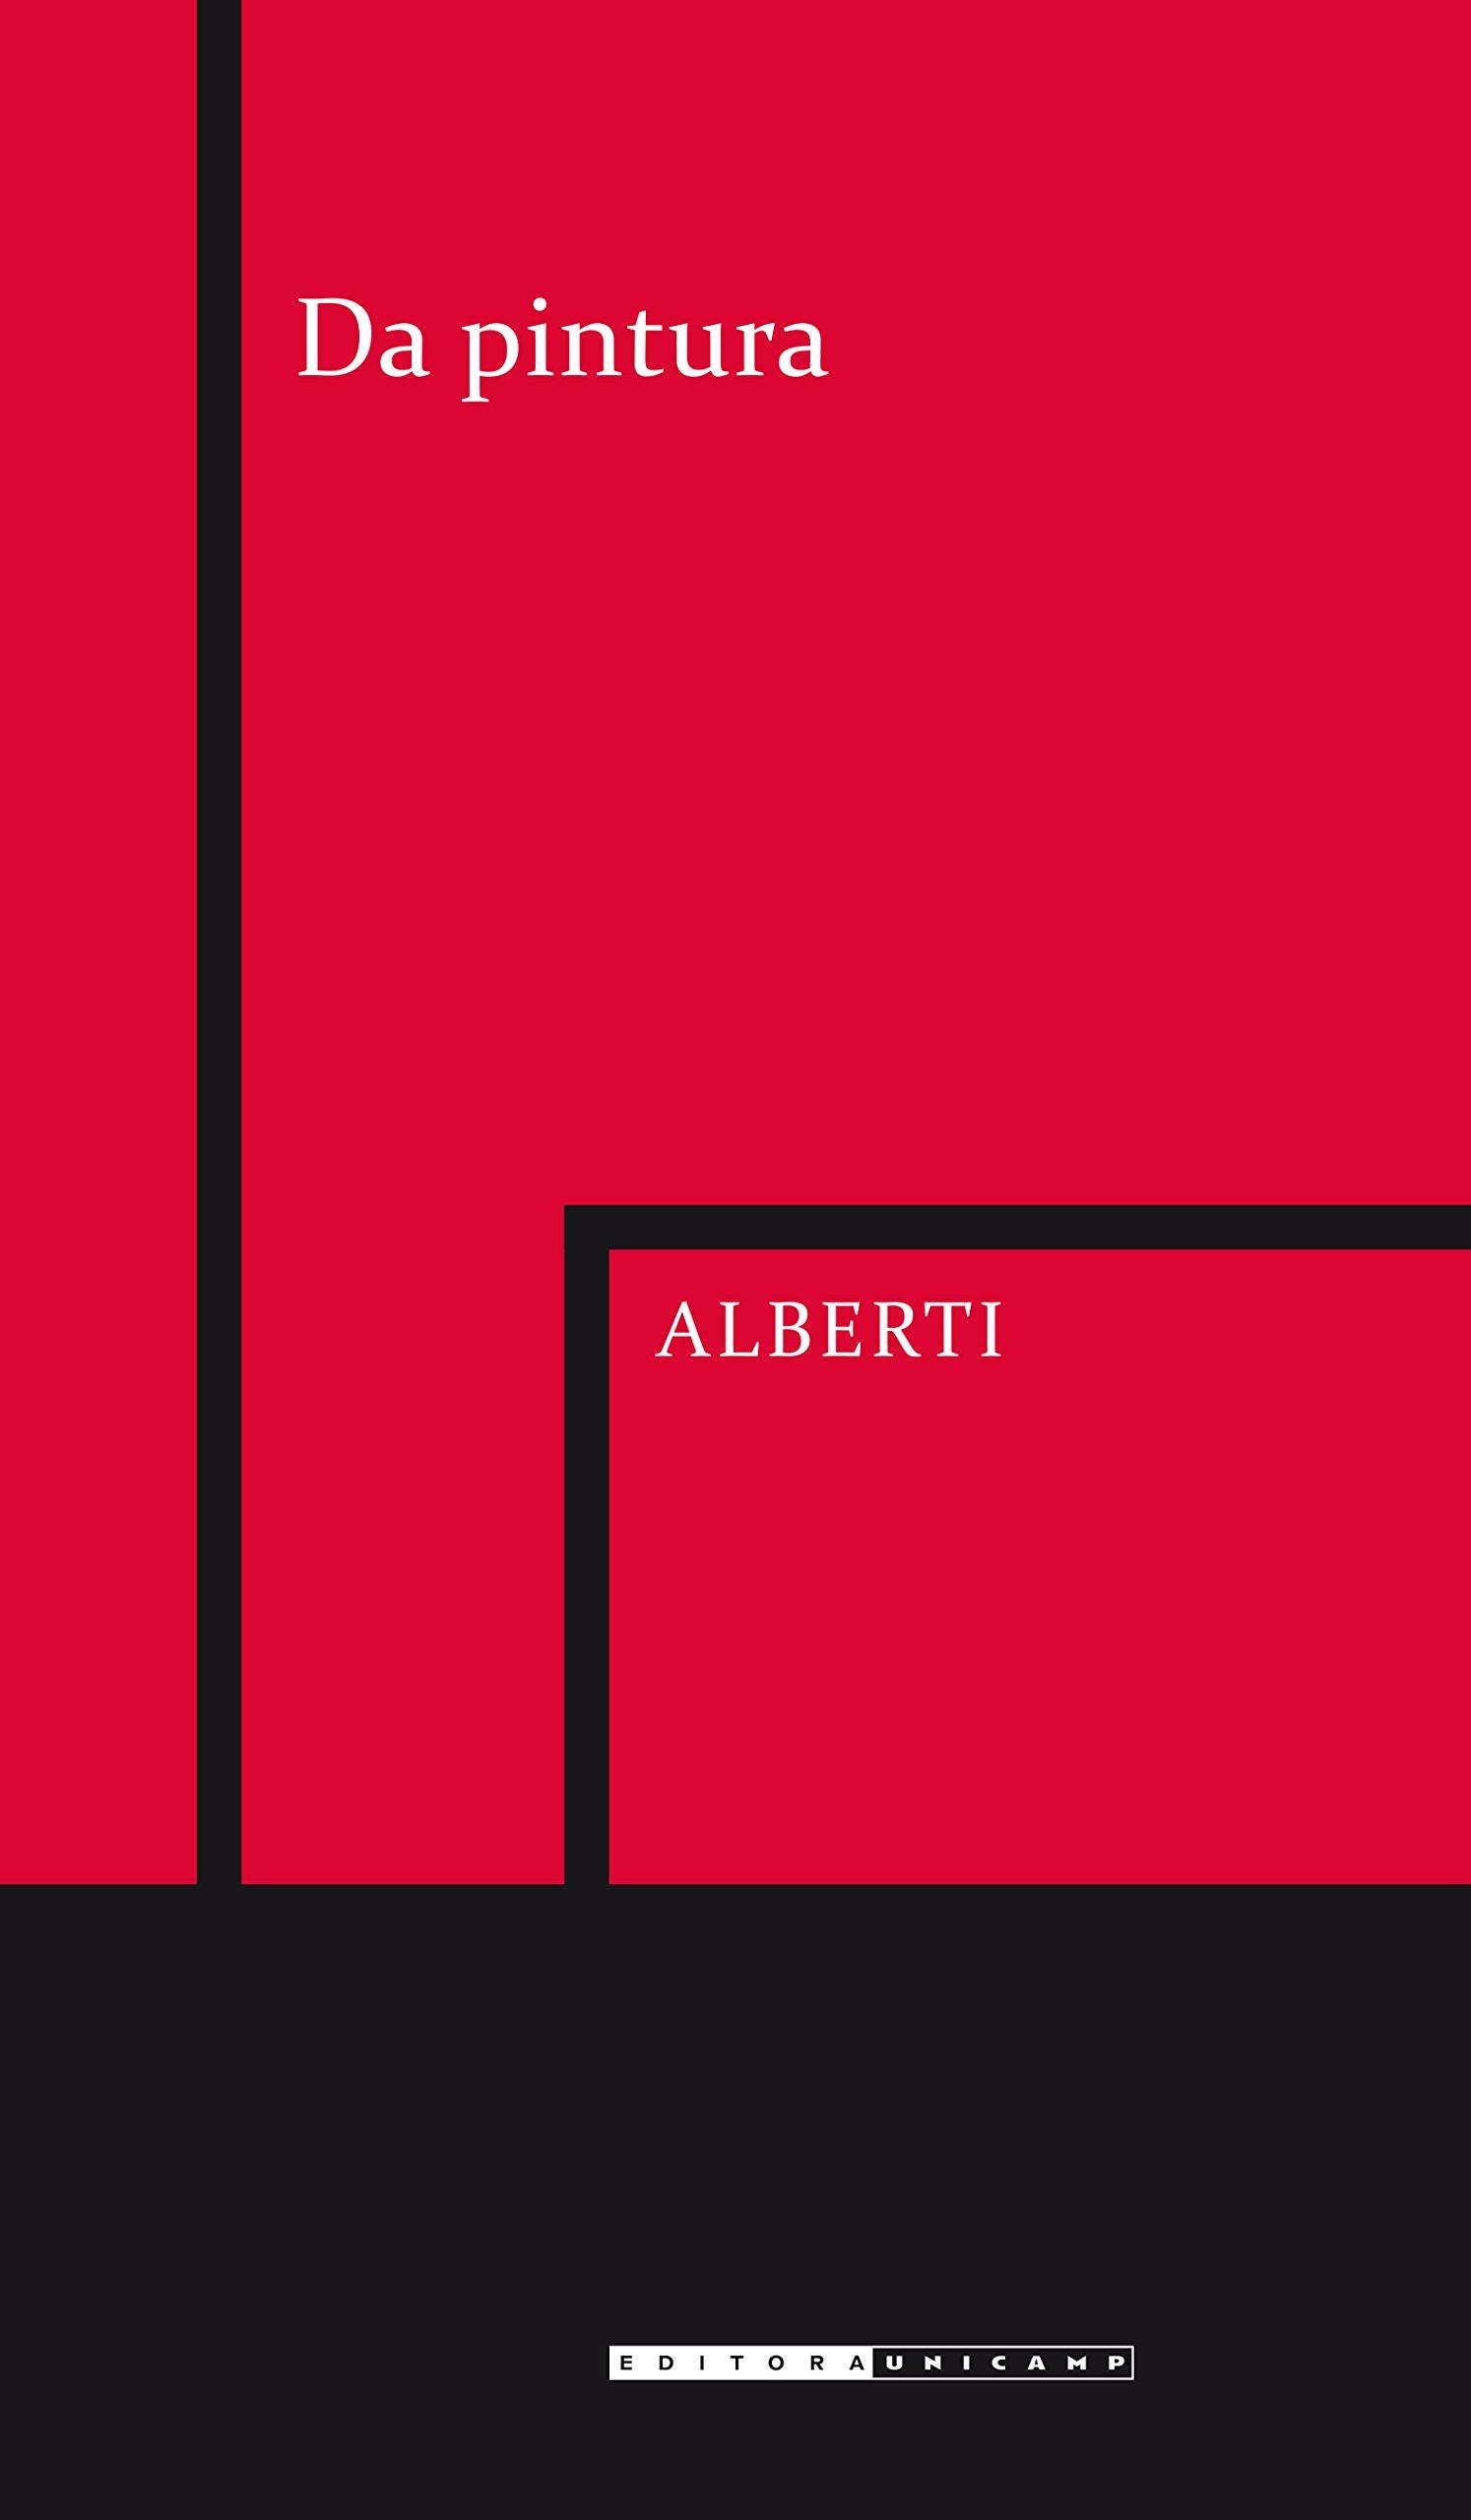 Da pintura, livro de Leon Battista Alberti